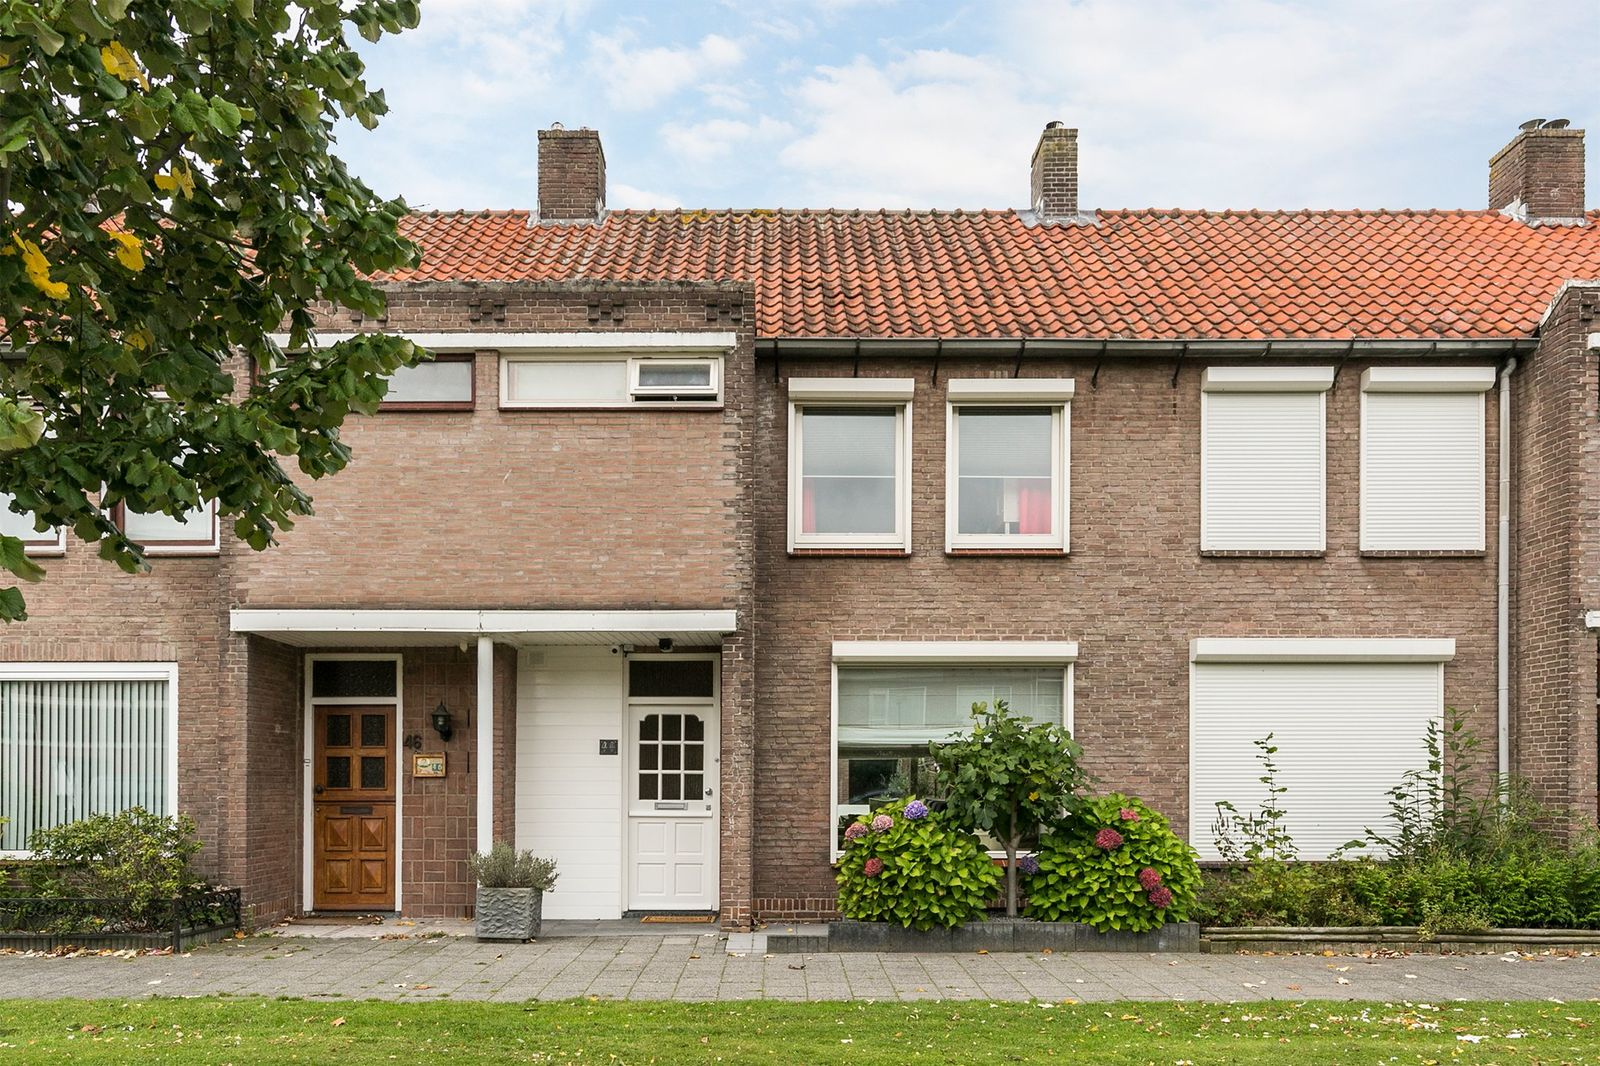 Tempelierstraat 44, Oosterhout